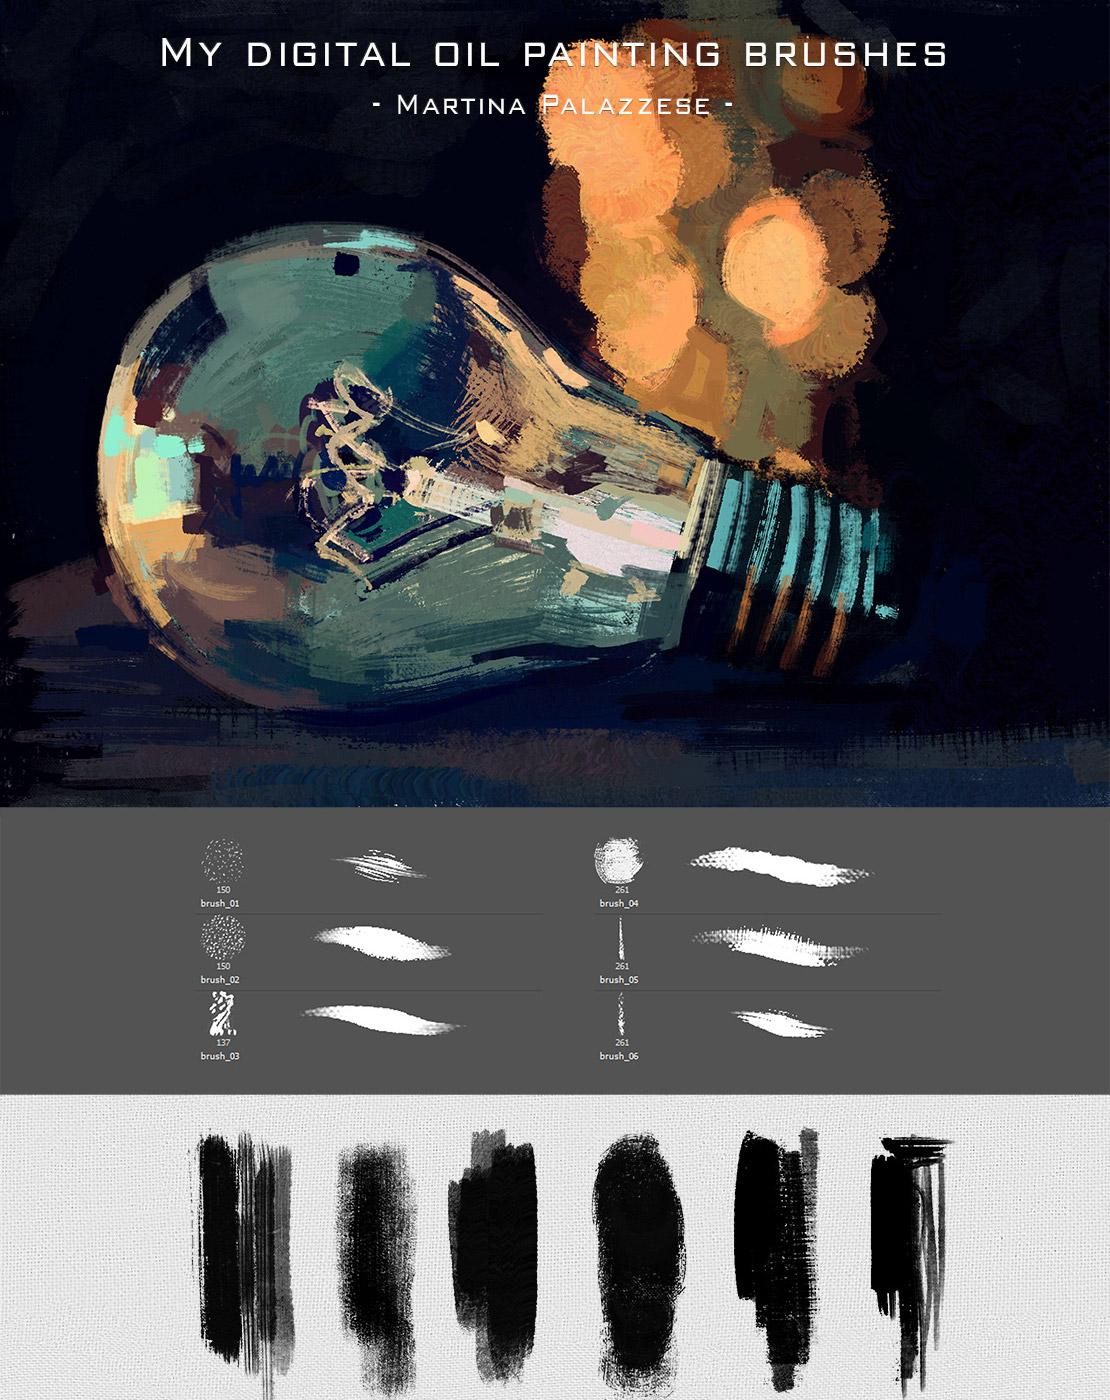 Digital Oil Painting Brushes